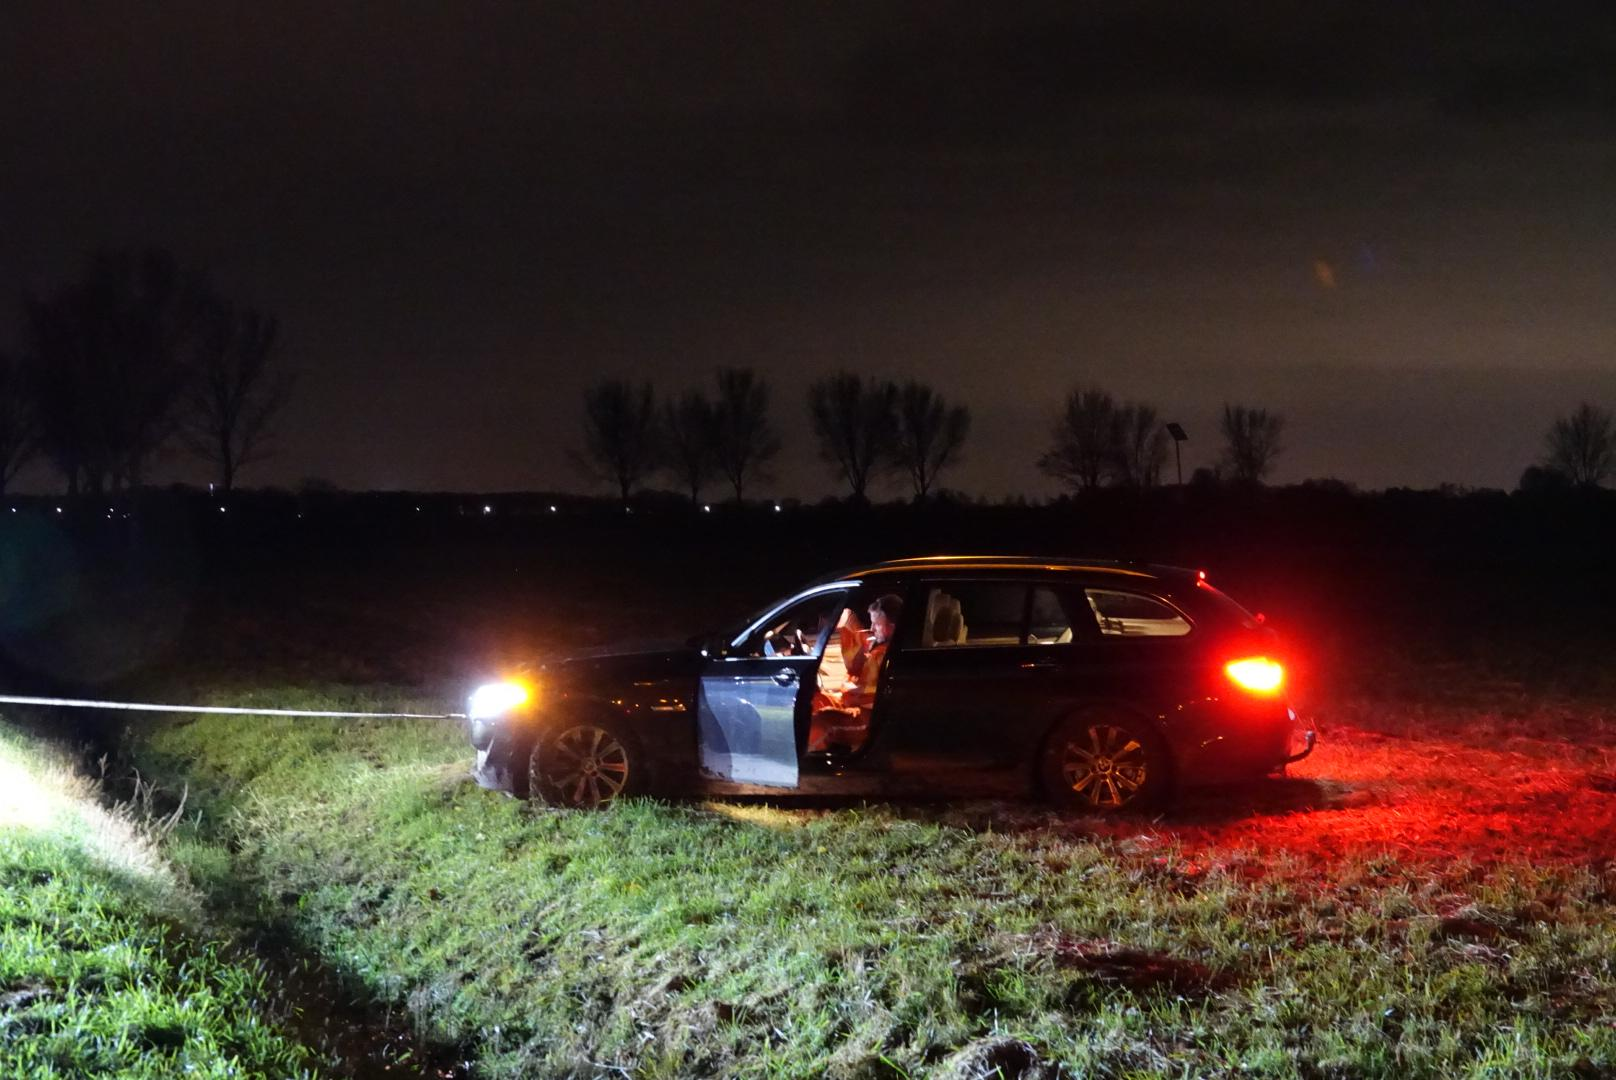 BMW belandt in weiland, tankwagen vol melk vast in berm in Middenbeemster